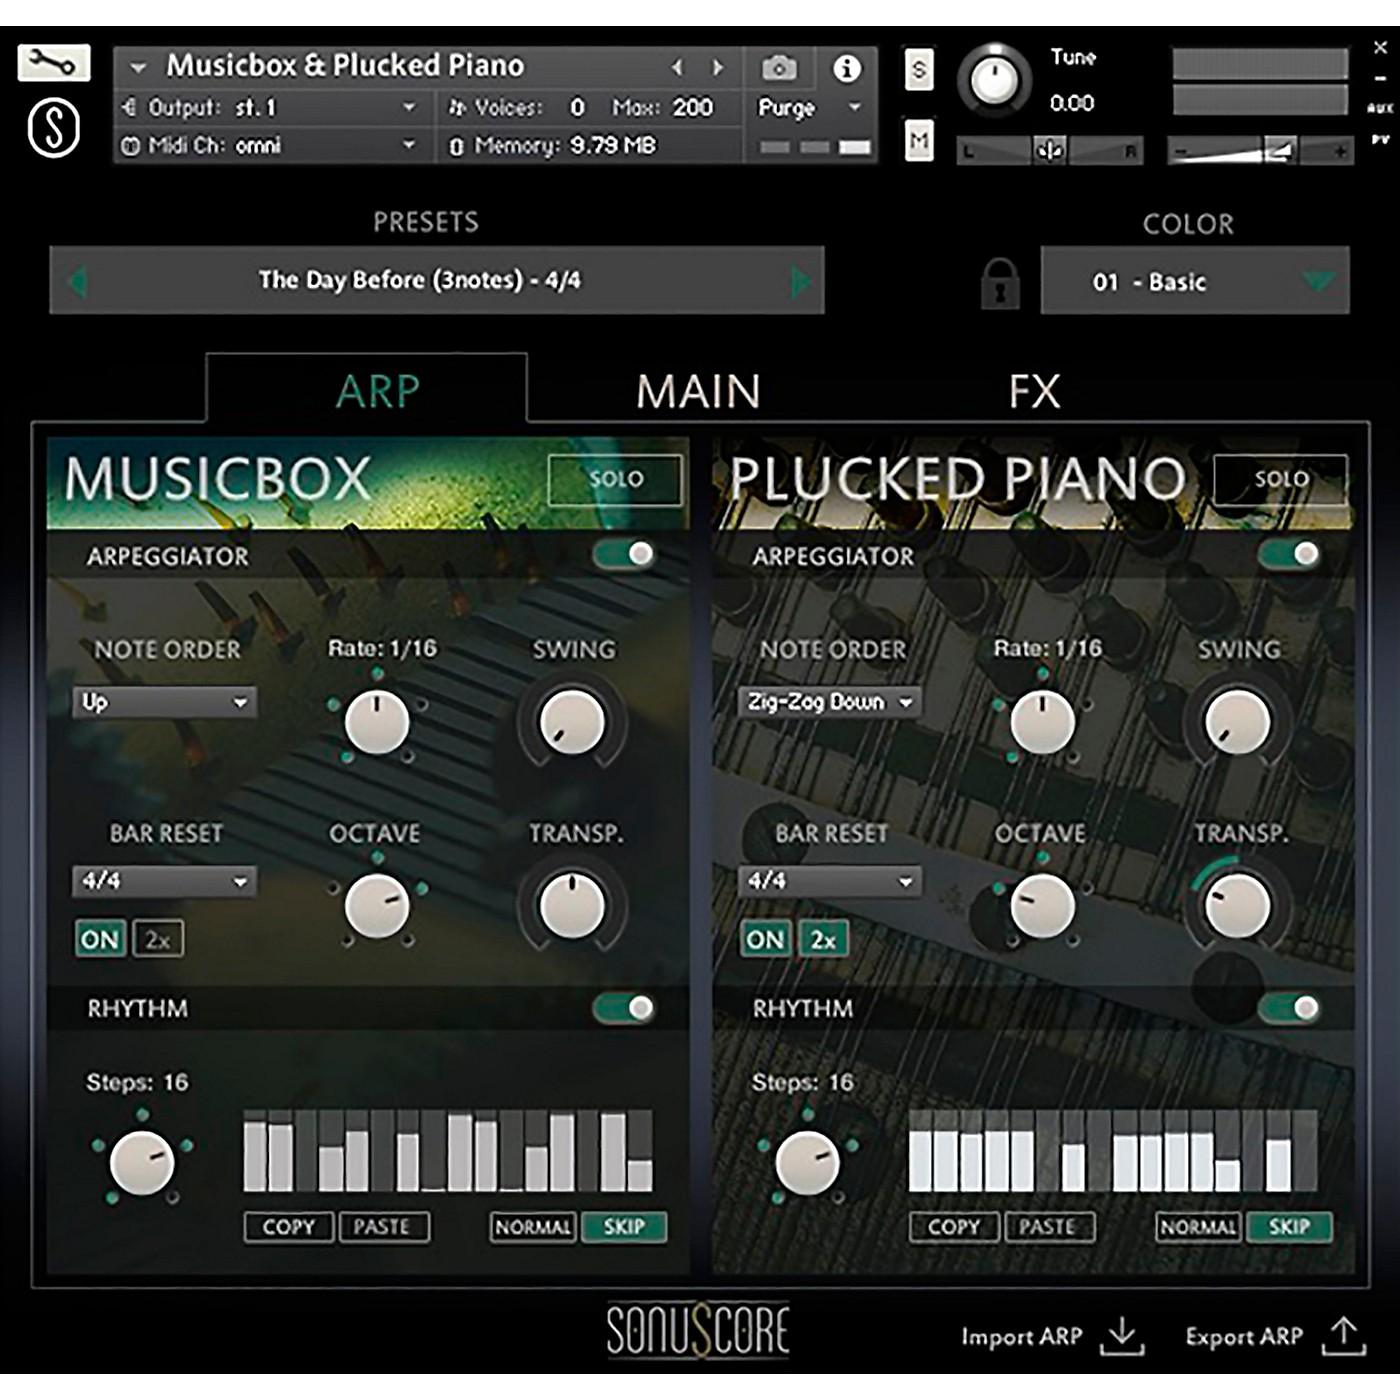 Sonuscore Origins Series Vol. 2 Music Box and Plucked Piano thumbnail